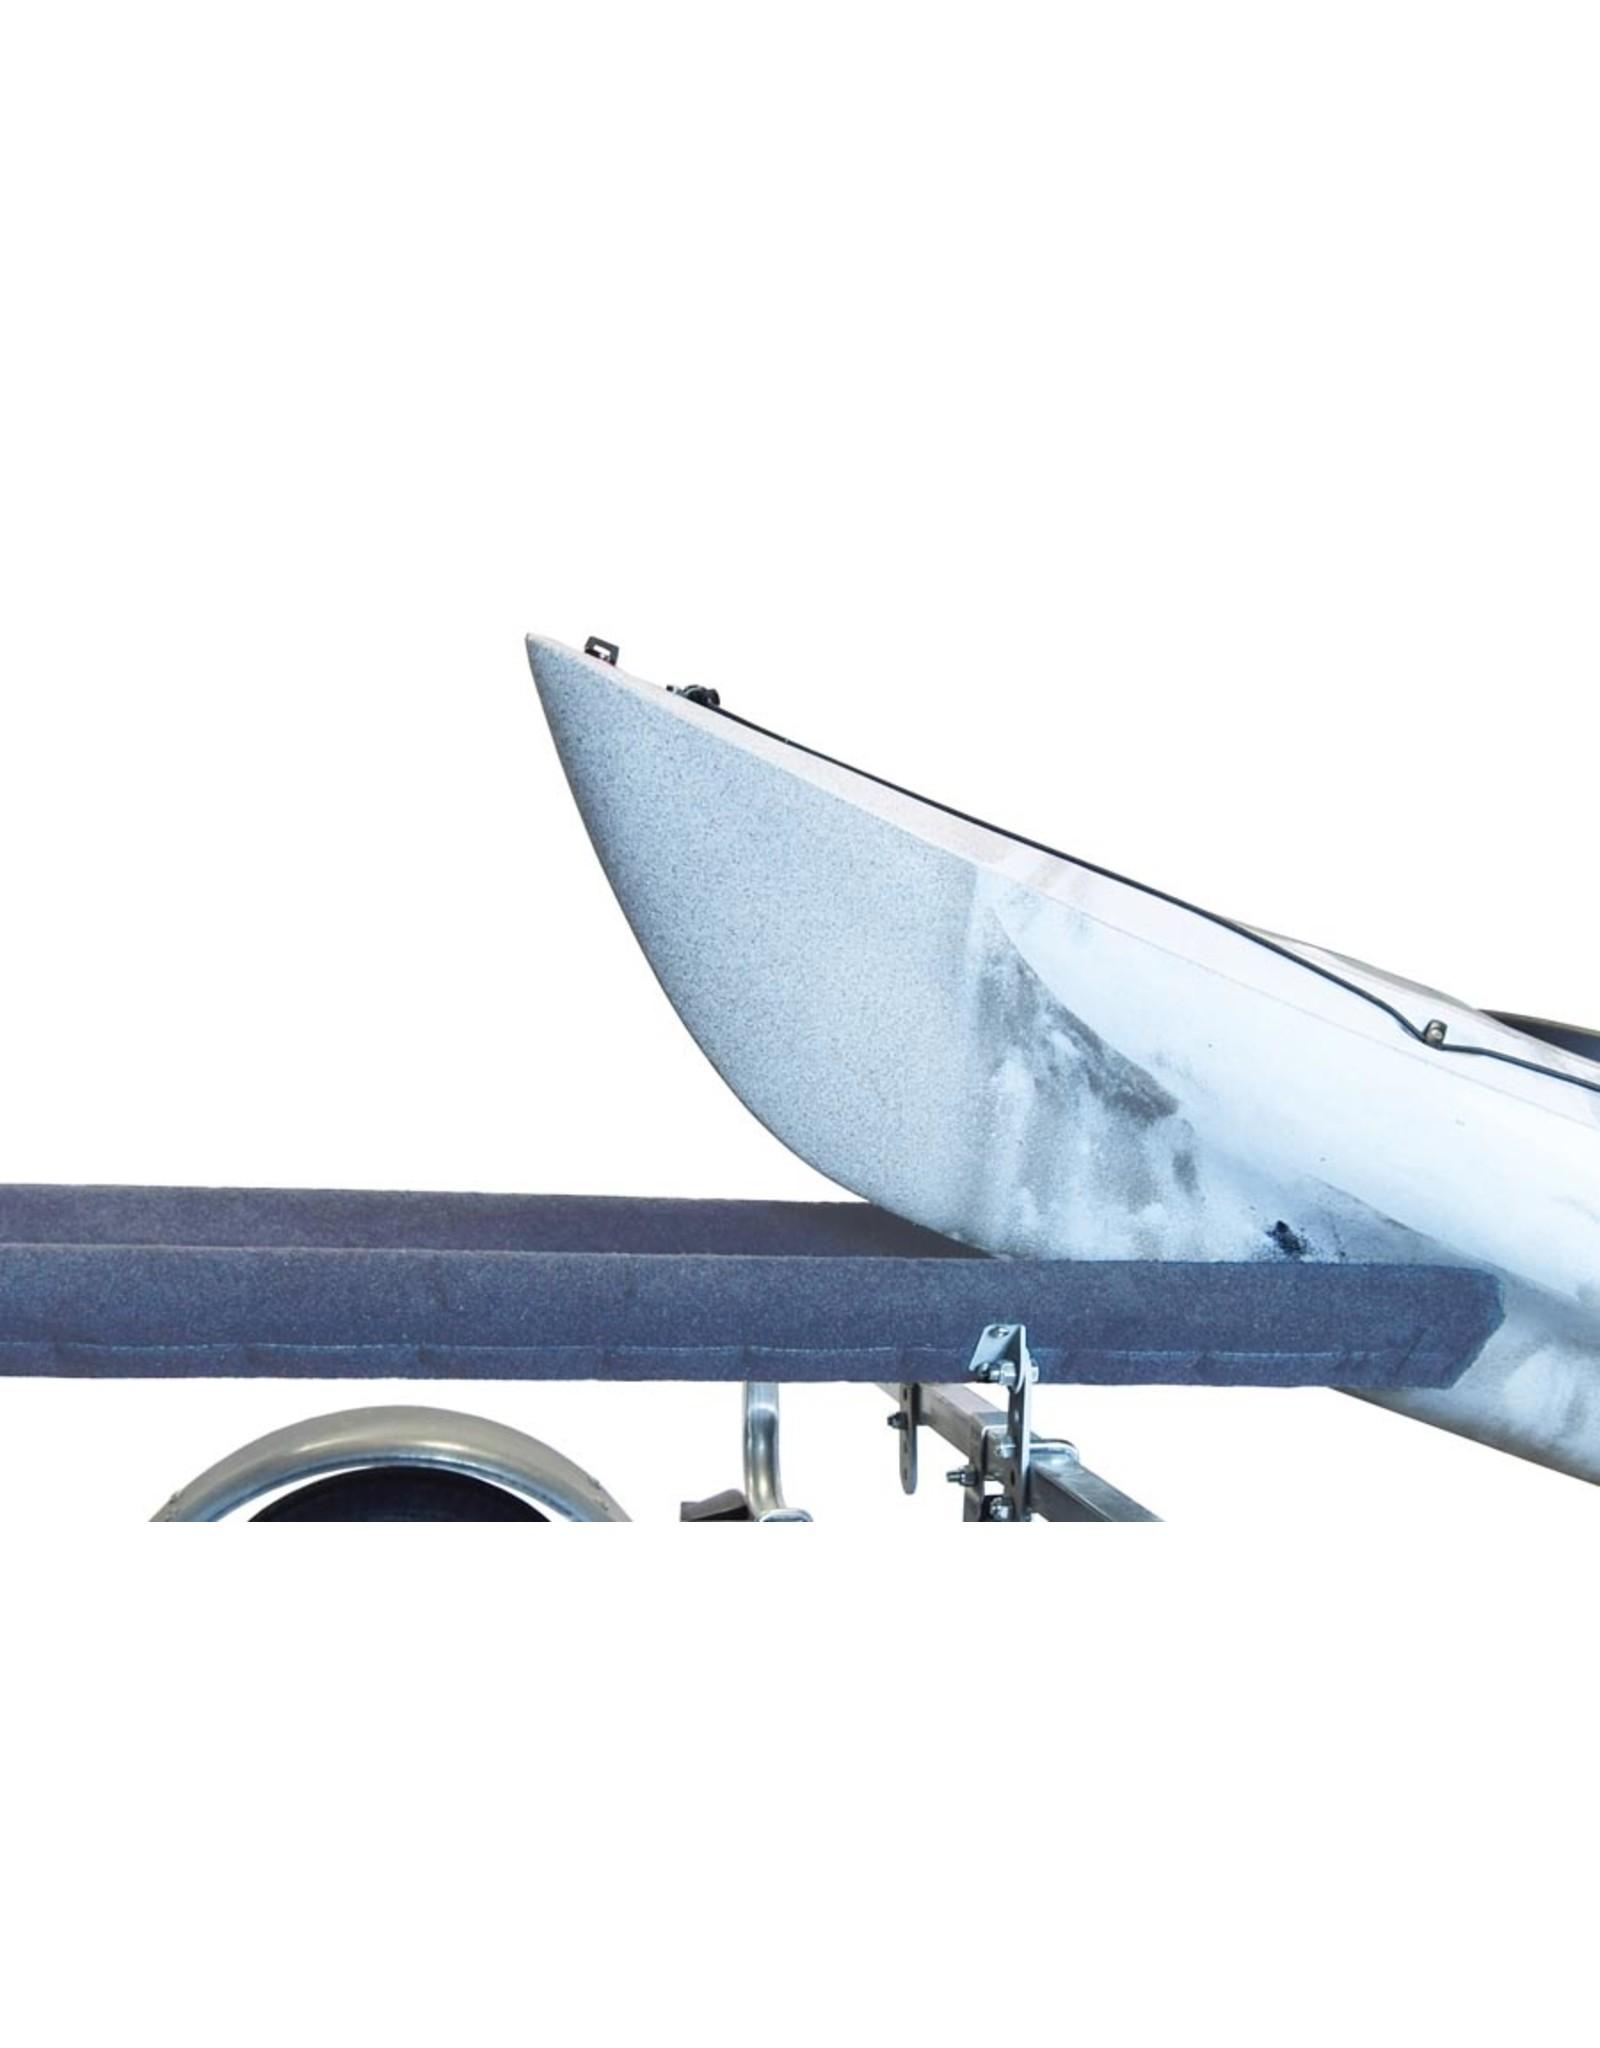 Malone Auto Rack Malone Large Kayak Bunk Kit for trailer